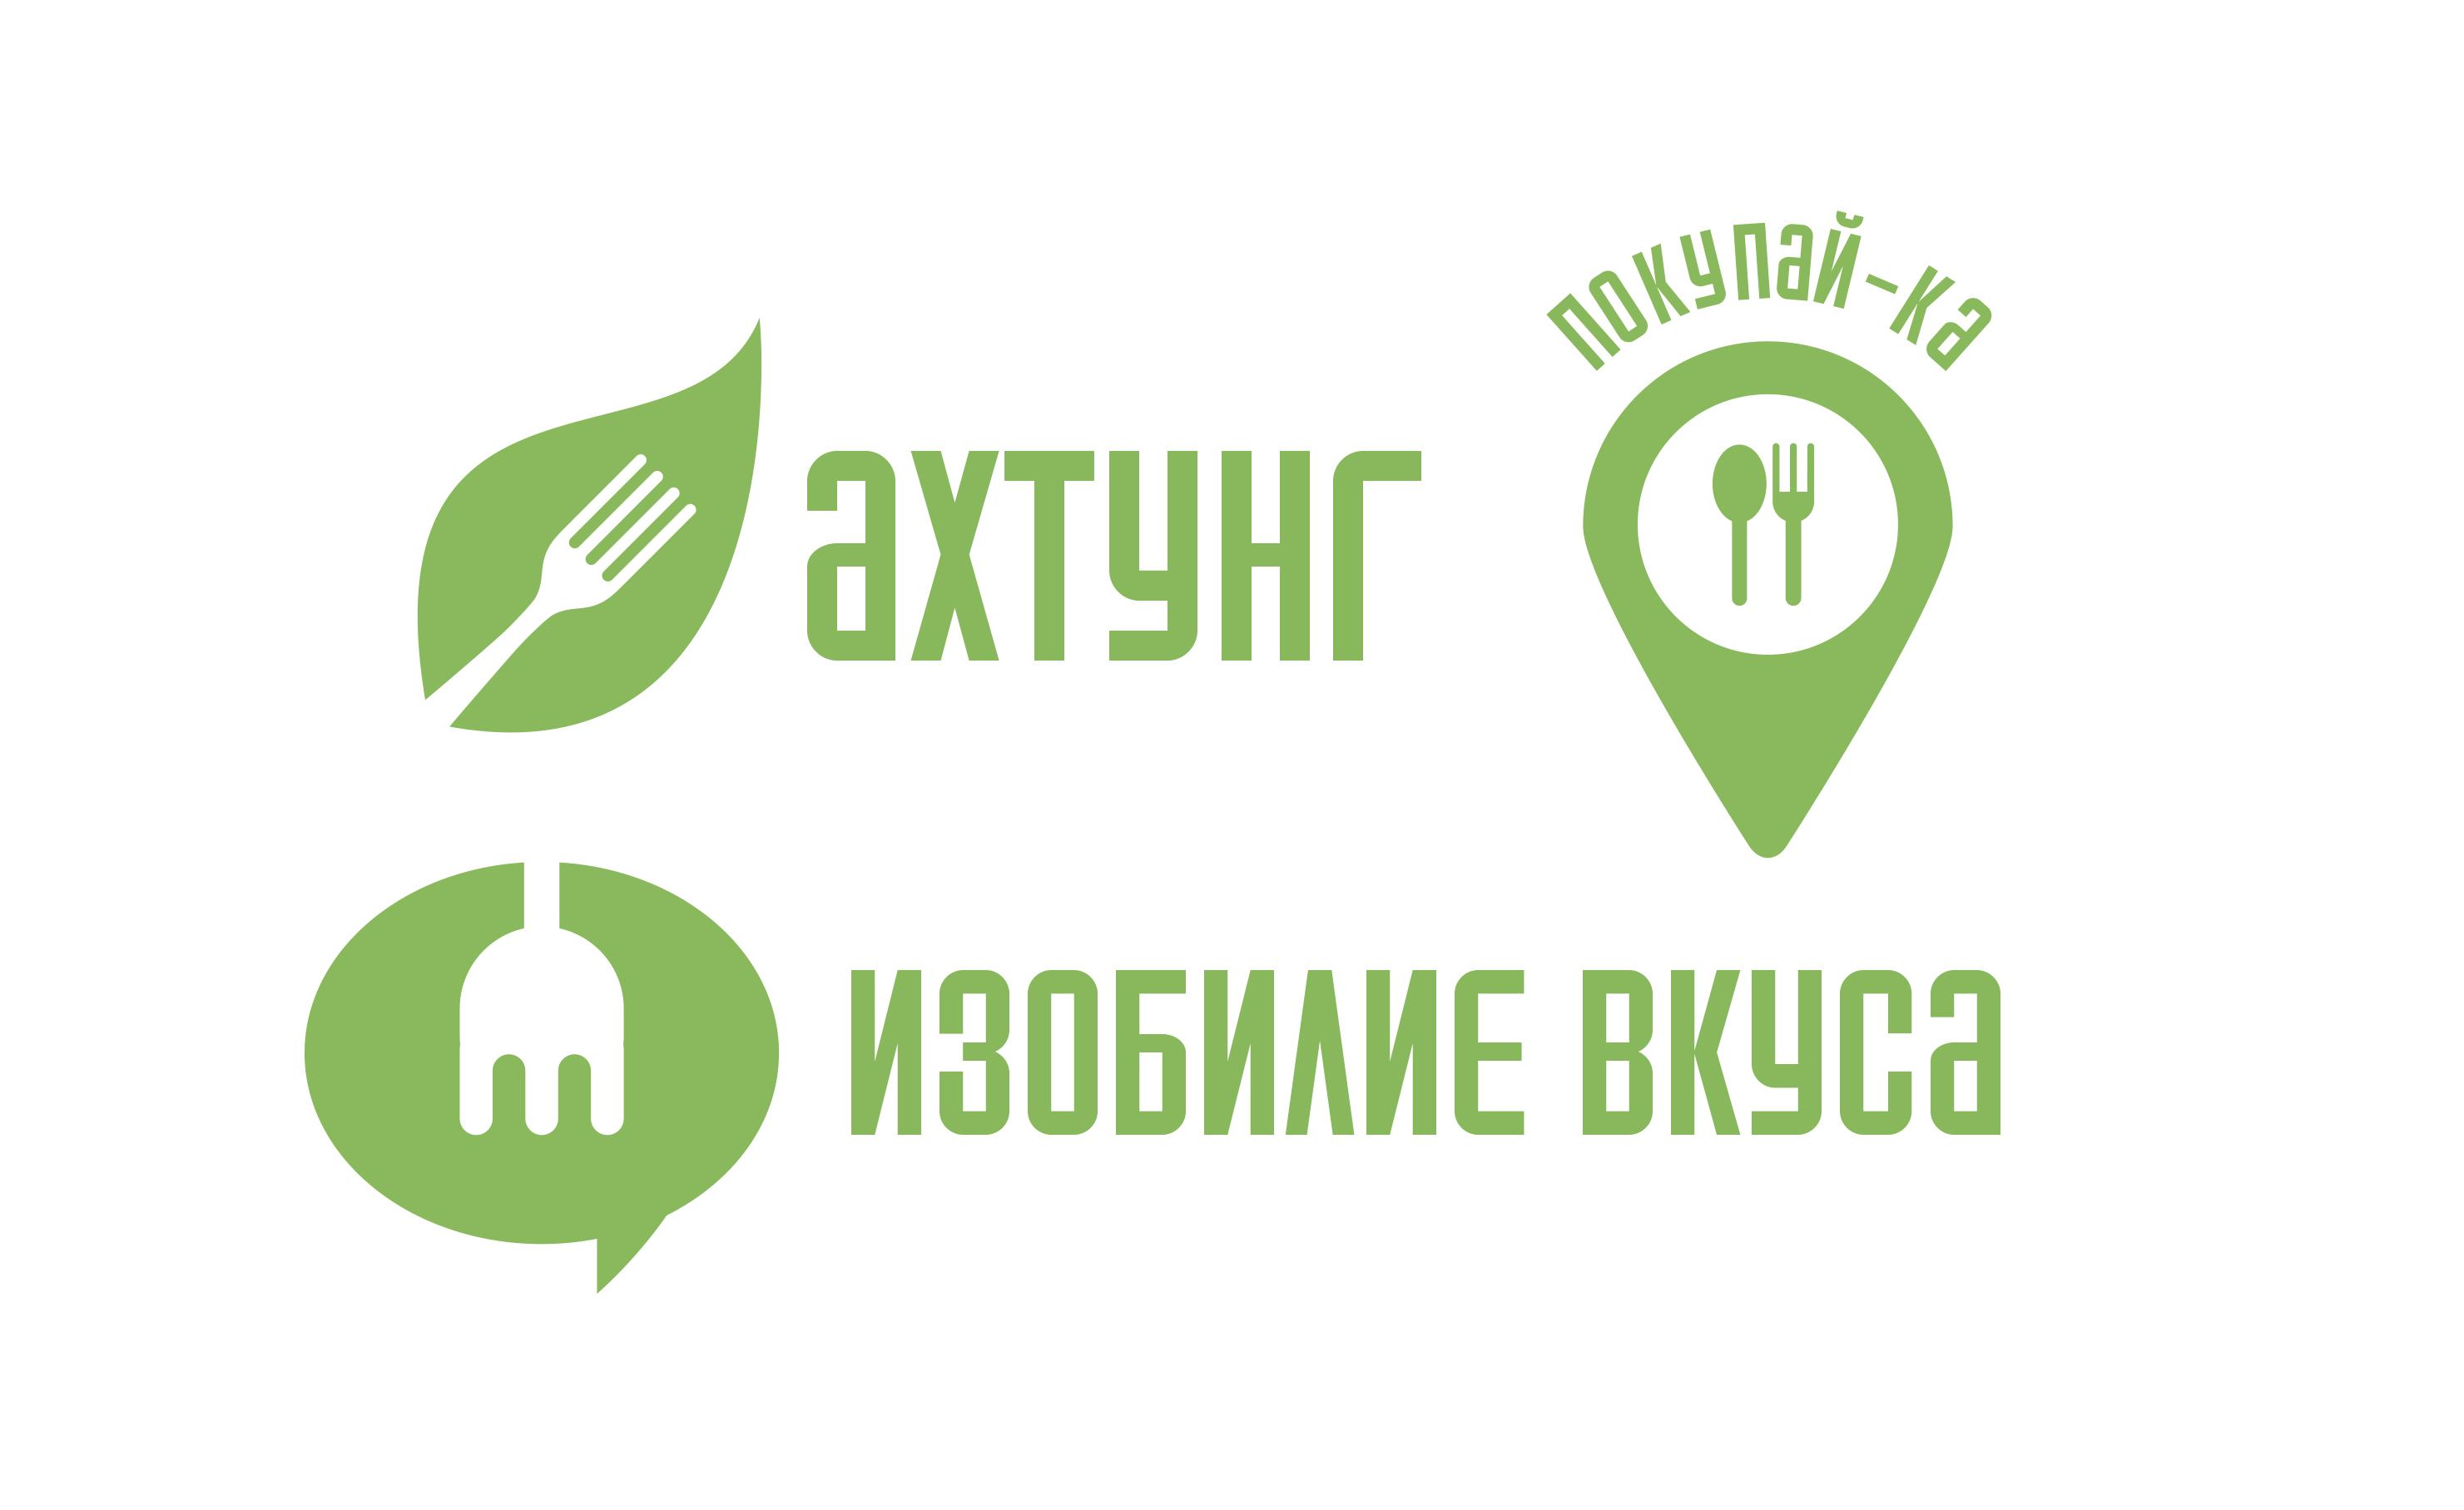 Нейминг + логотип фото f_66656ec3a8eddec6.jpg